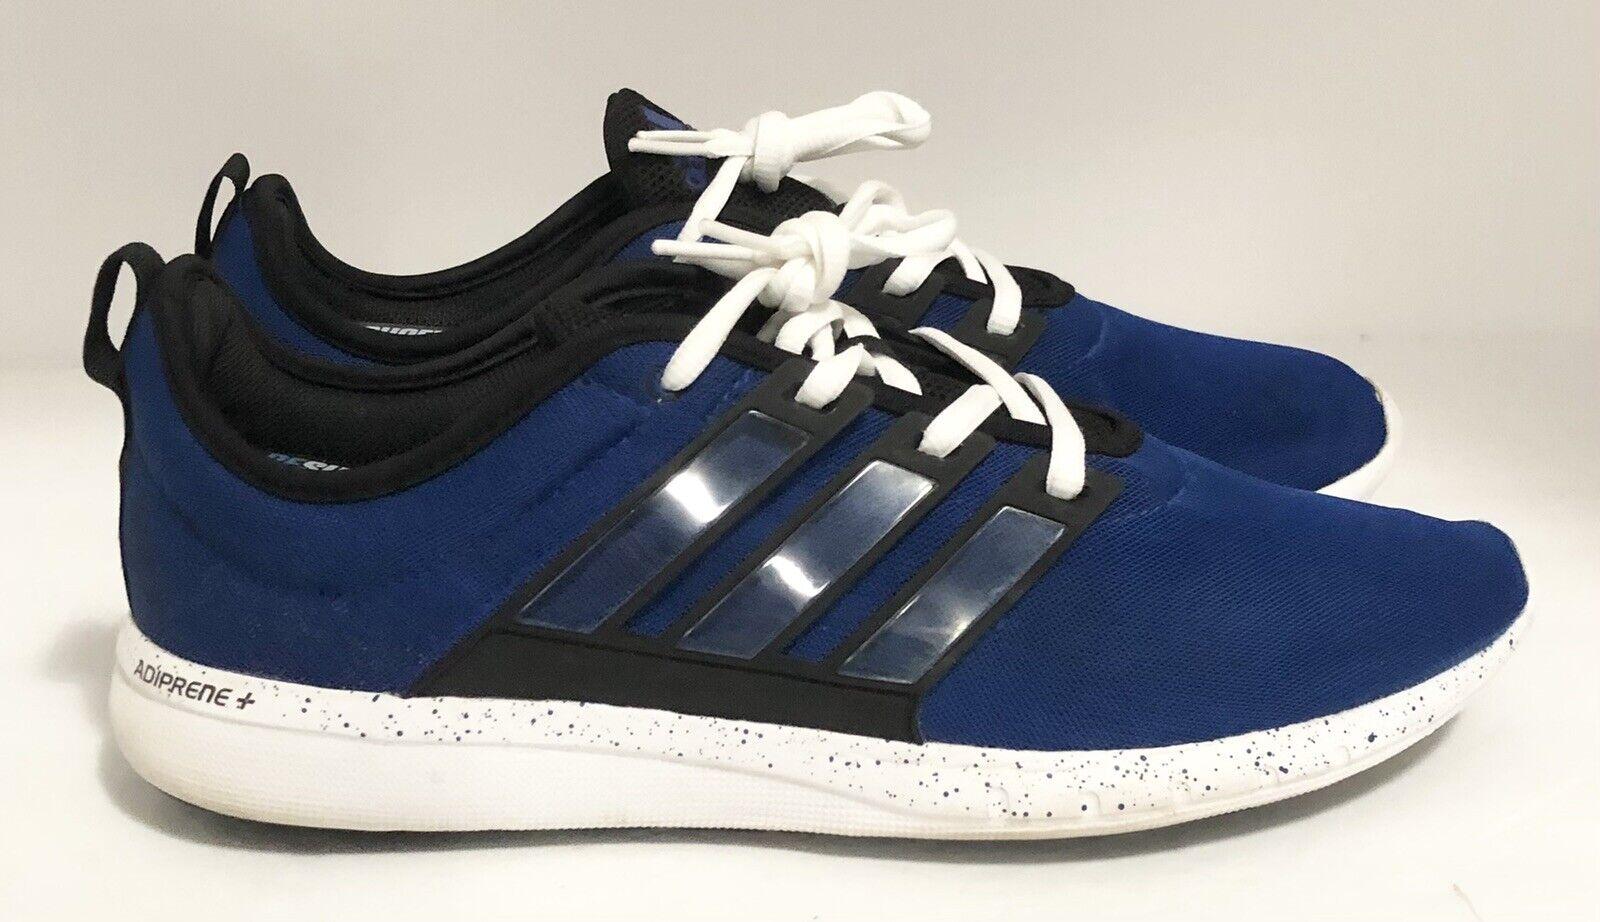 Adidas Climacool Leap Men's US Size 10 Blue Clear Run… - Gem